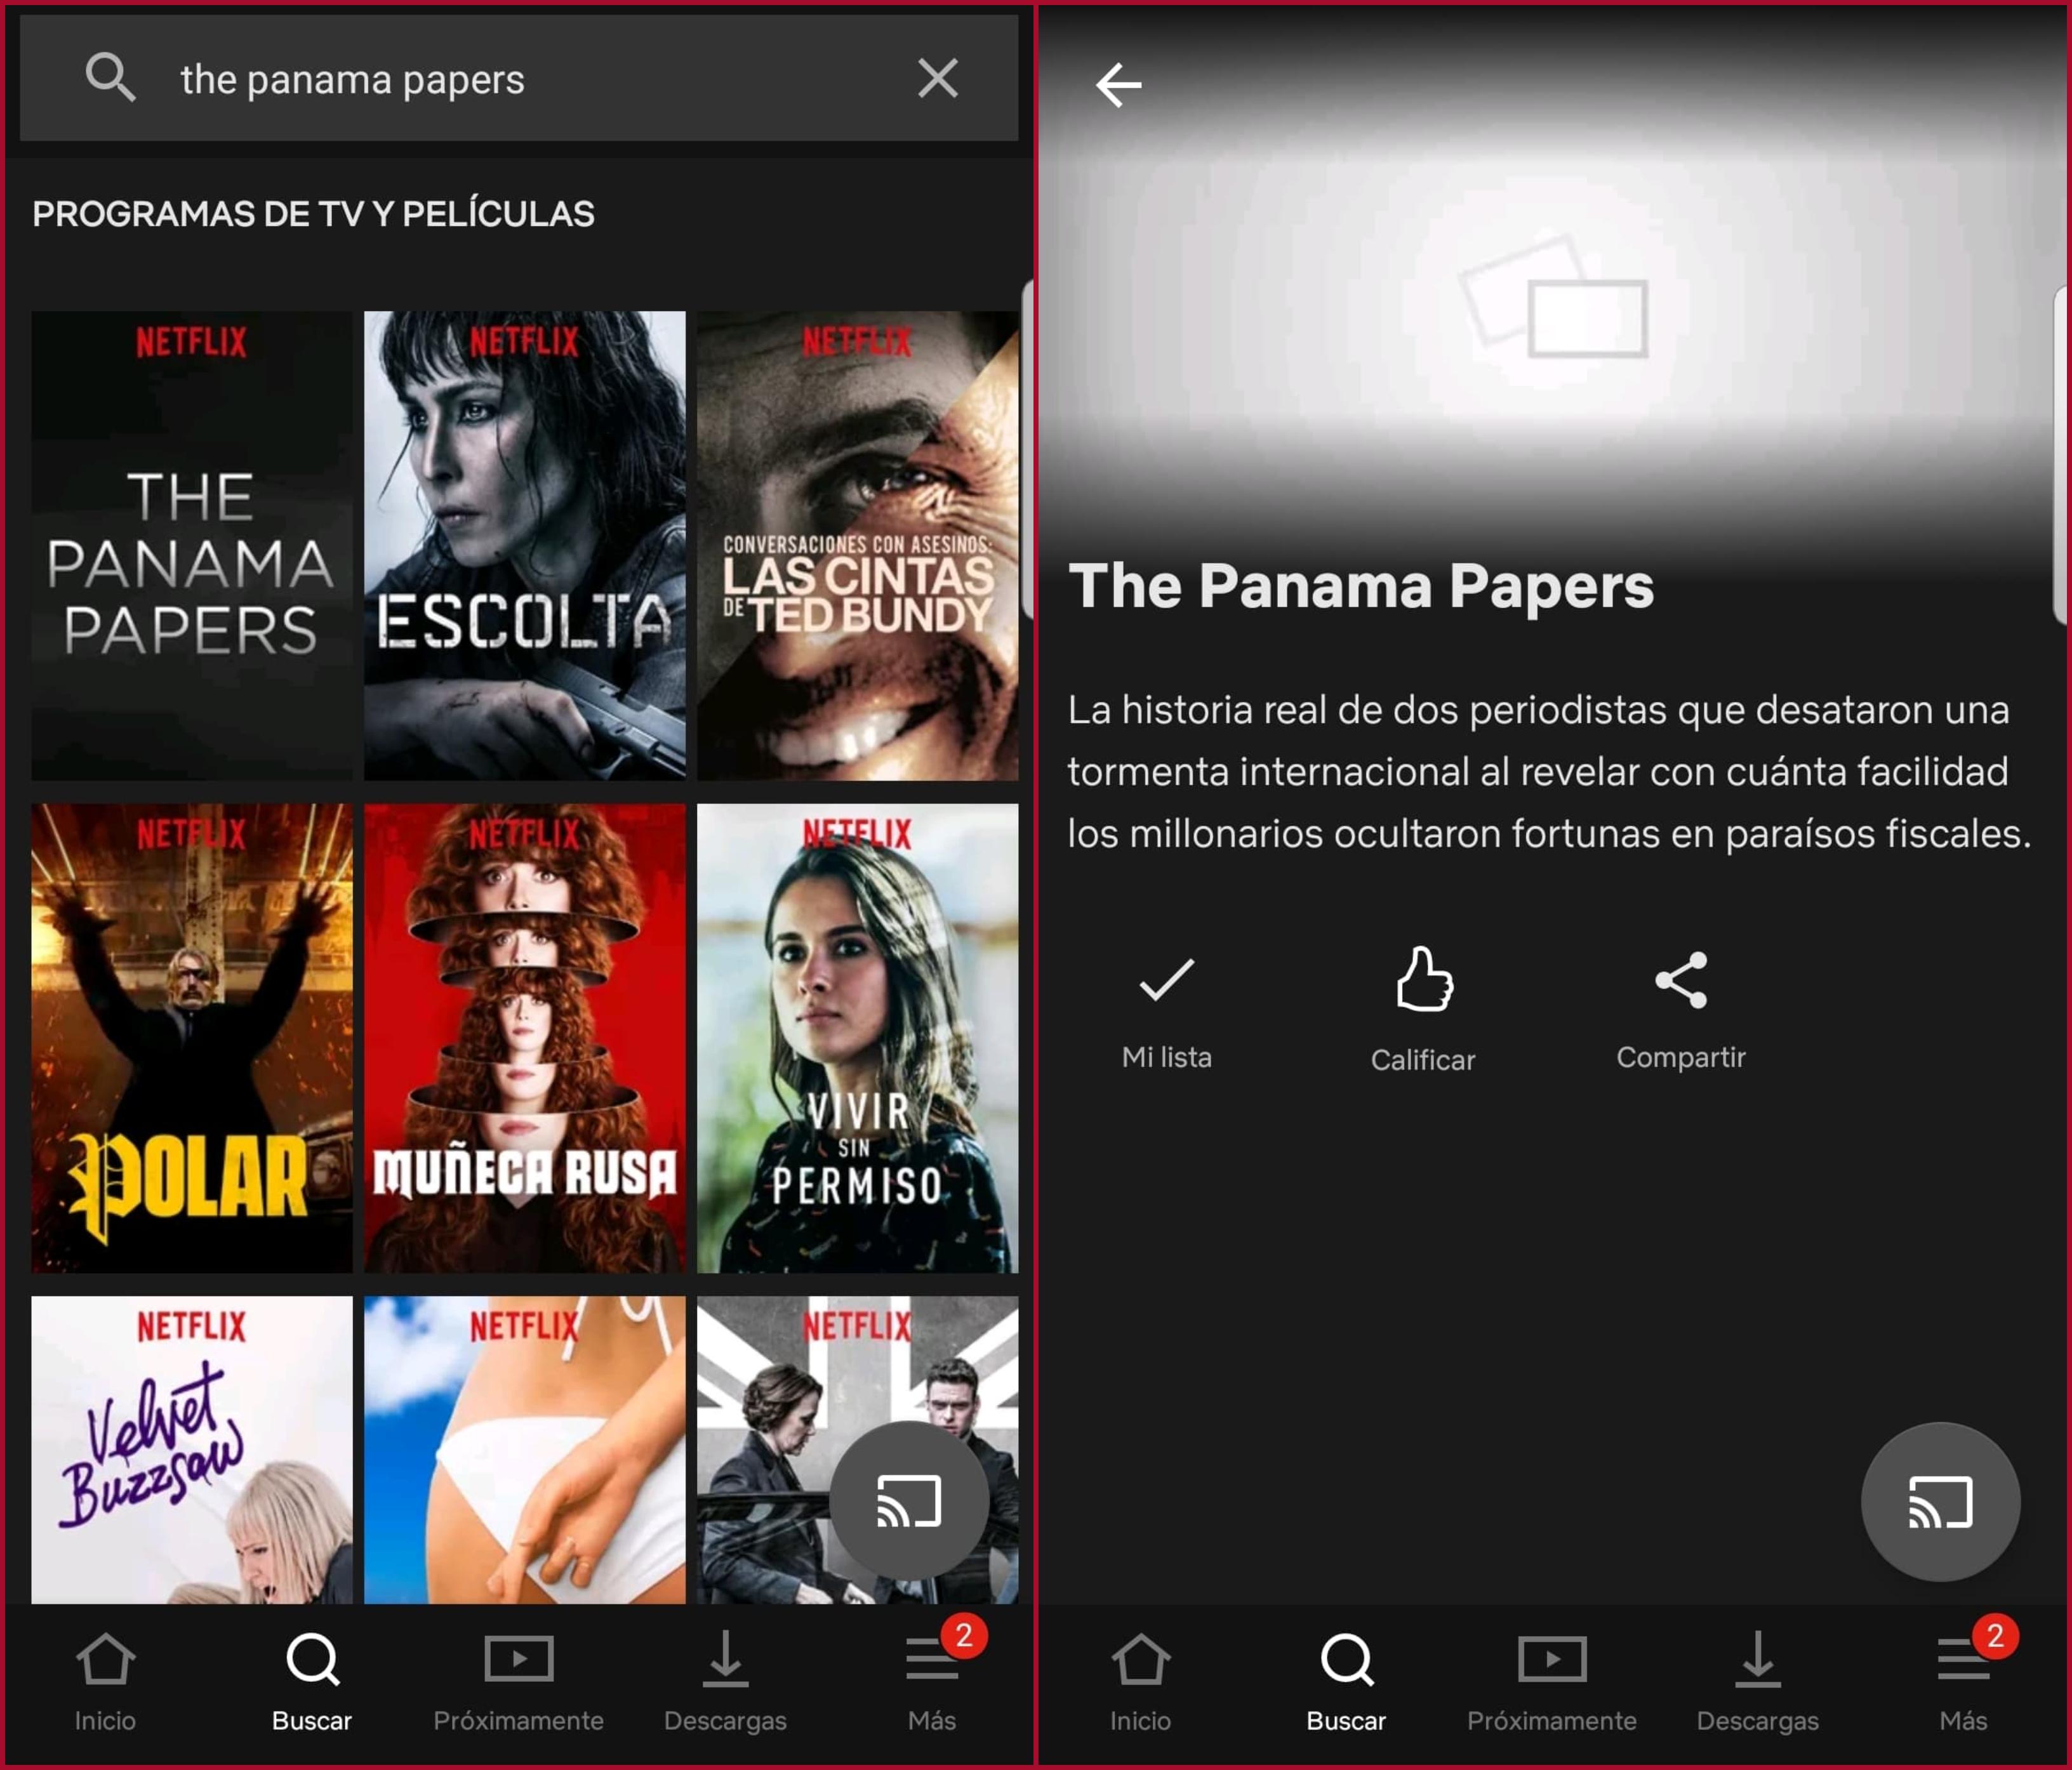 The Panama Papers - Netflix.jpg